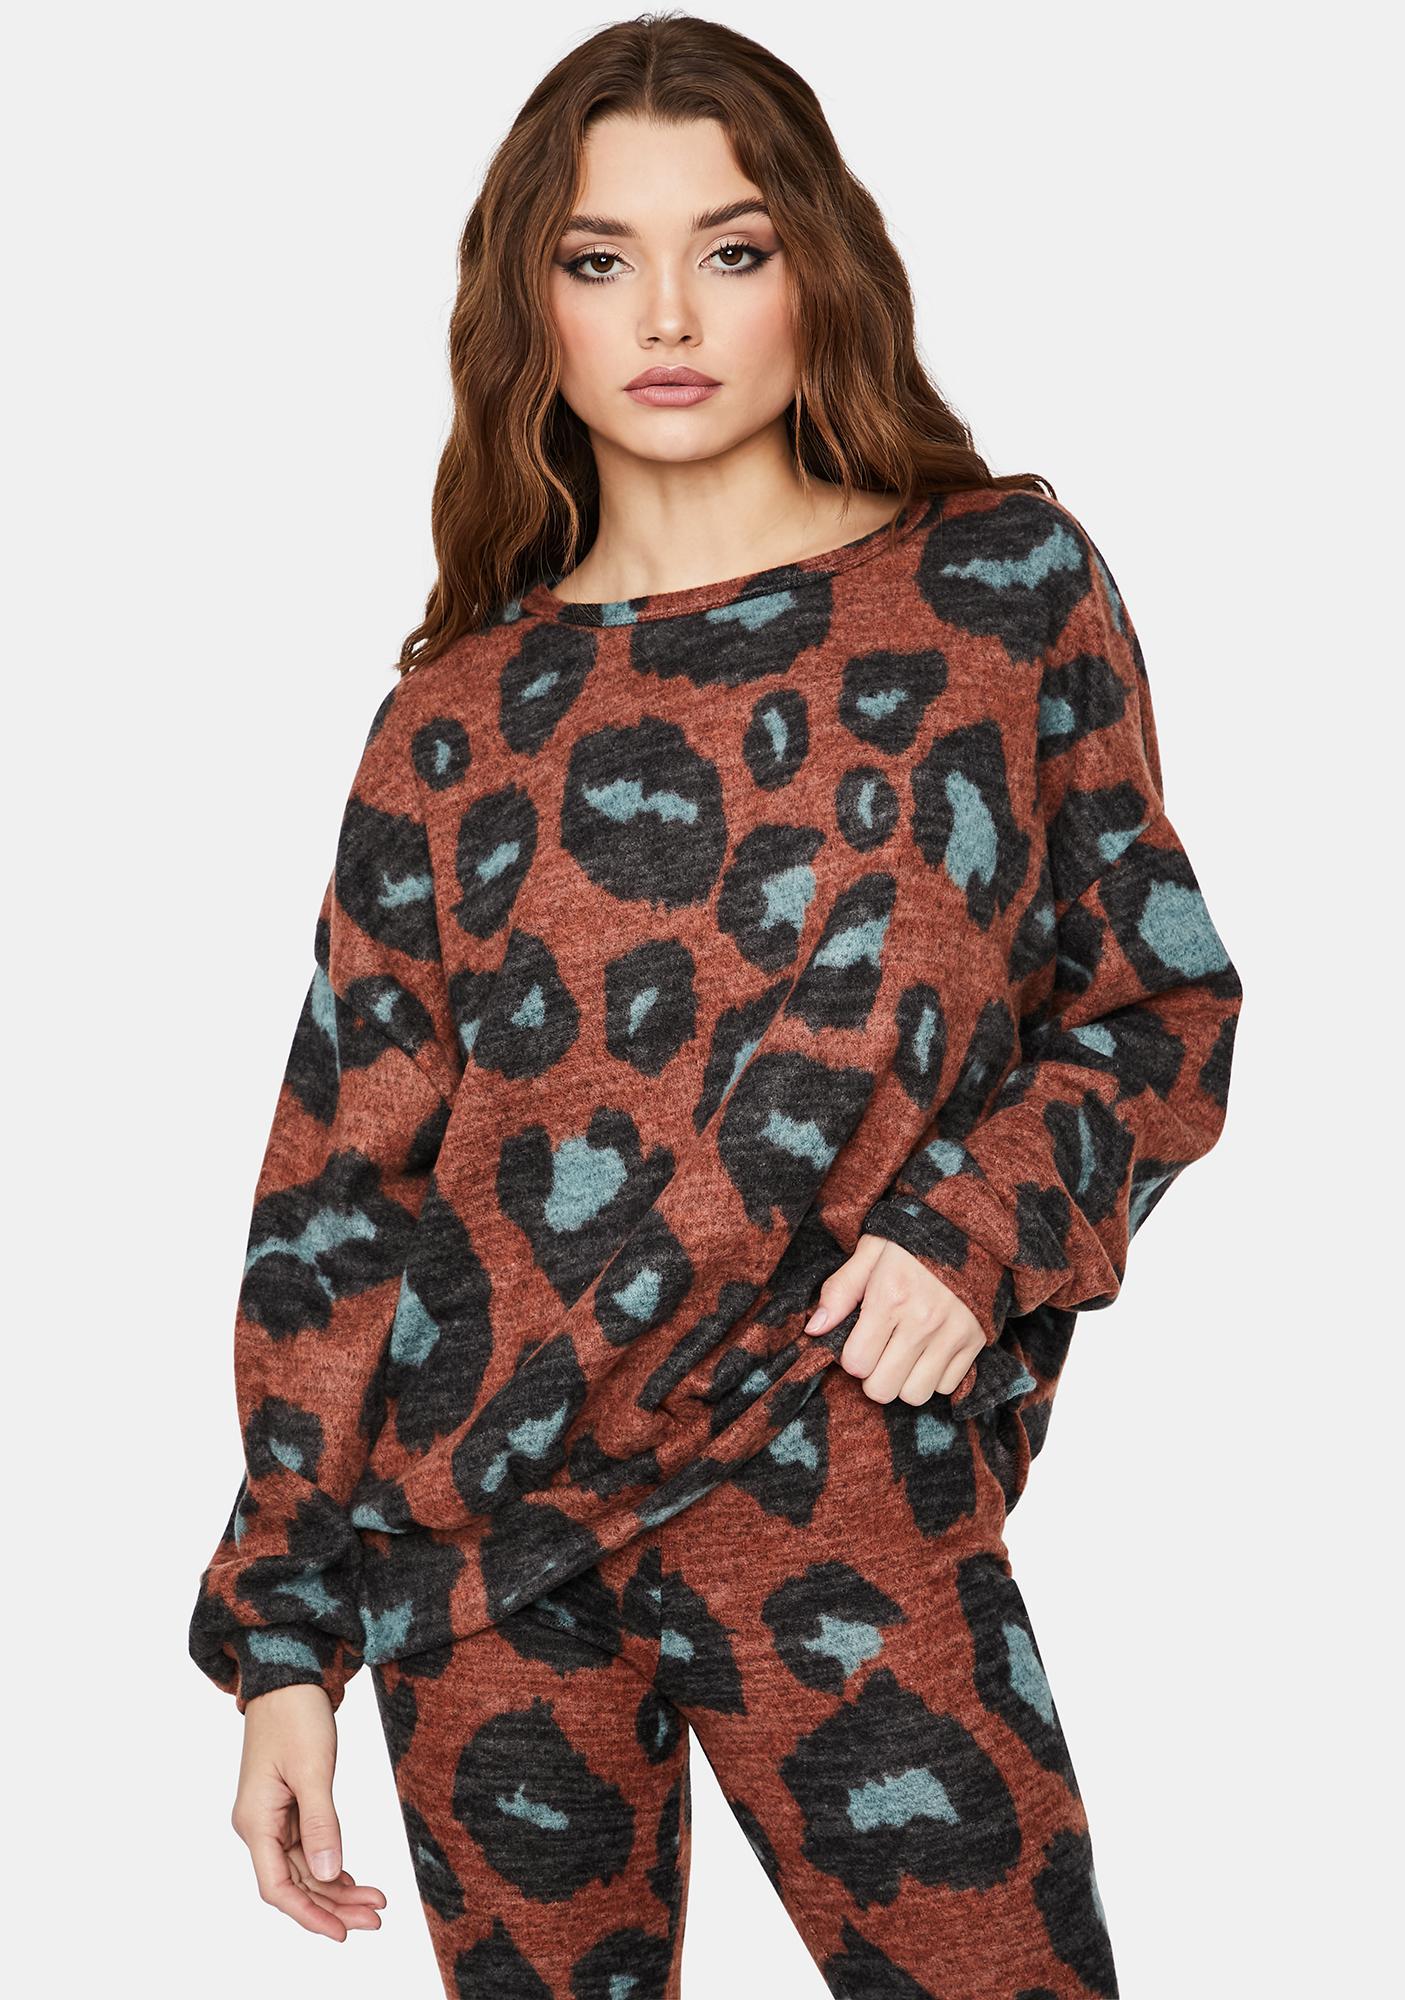 On The Catwalk Leopard Crewneck Sweater